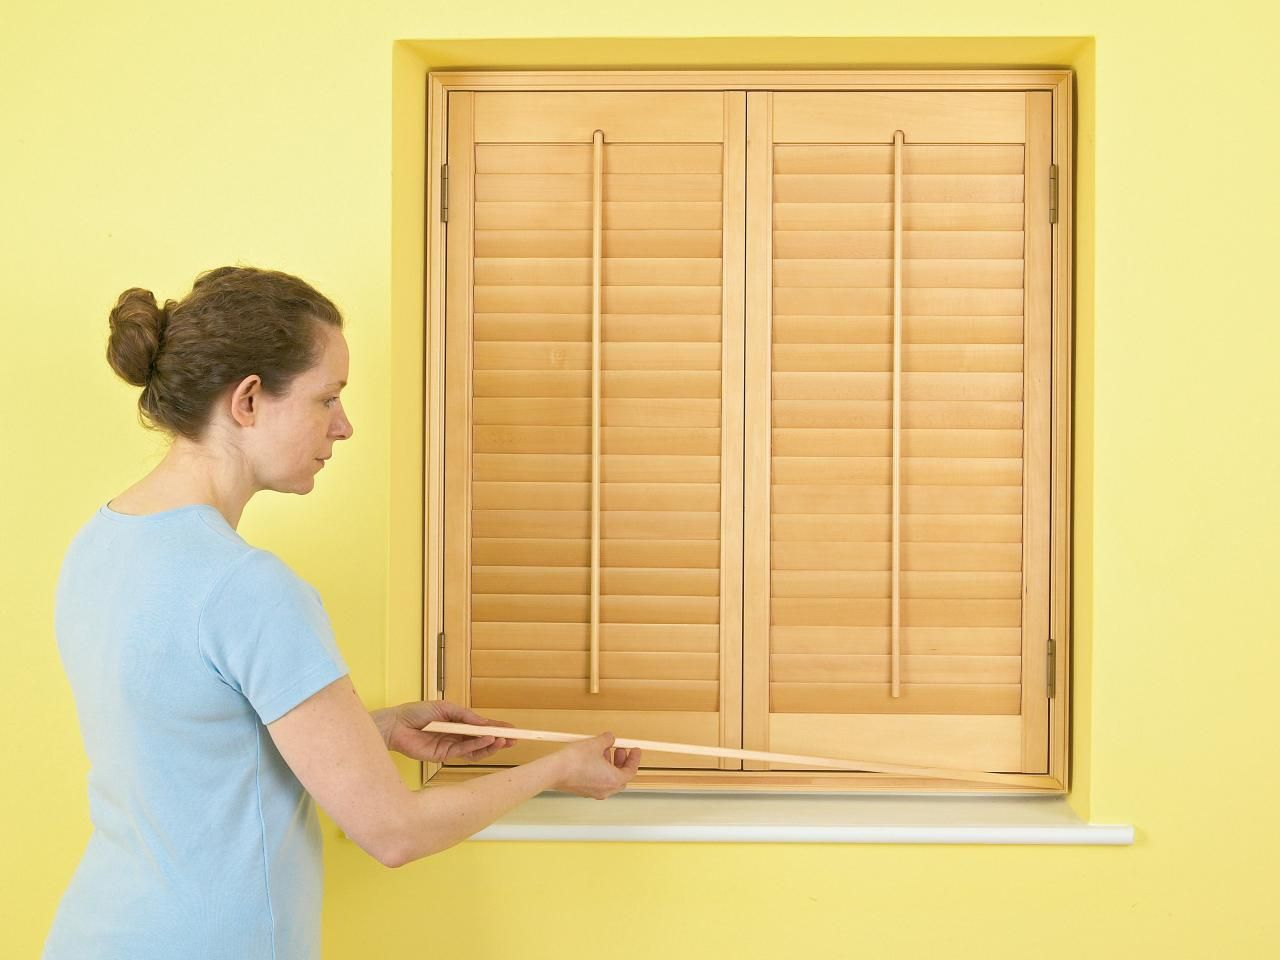 How to install interior shutters interior shutters interior